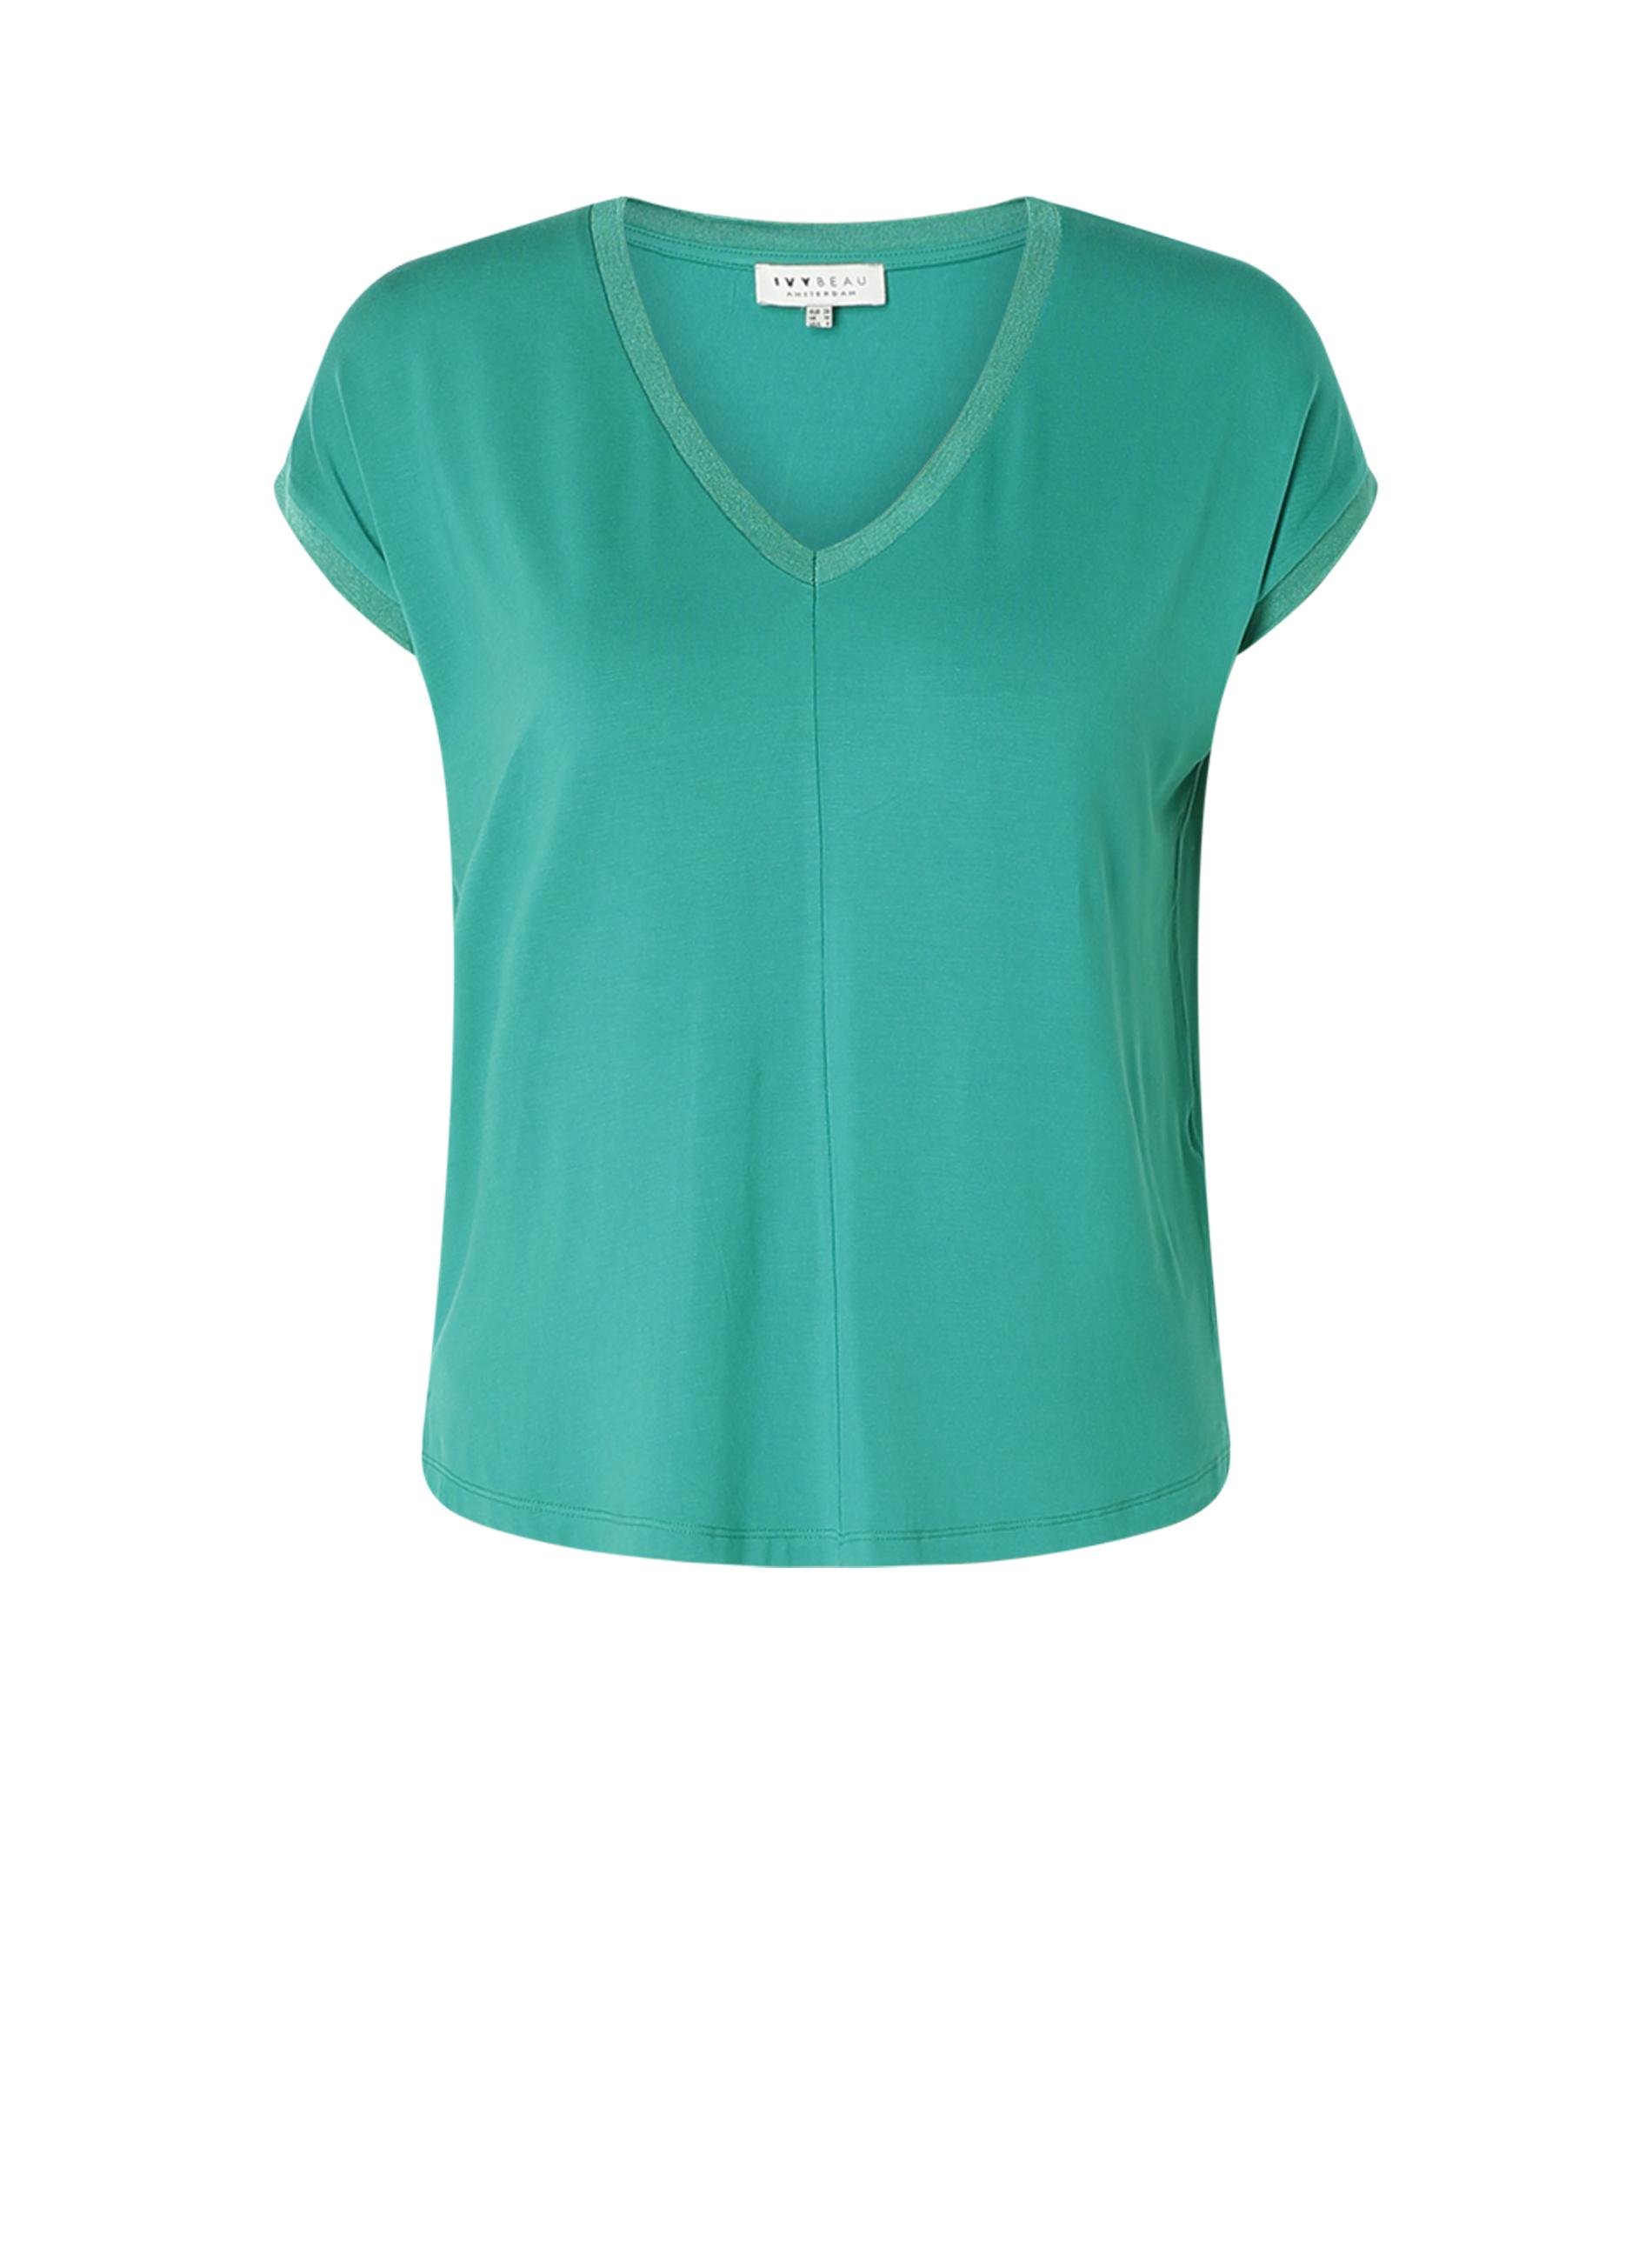 Shirt Fadime IVY BELLA